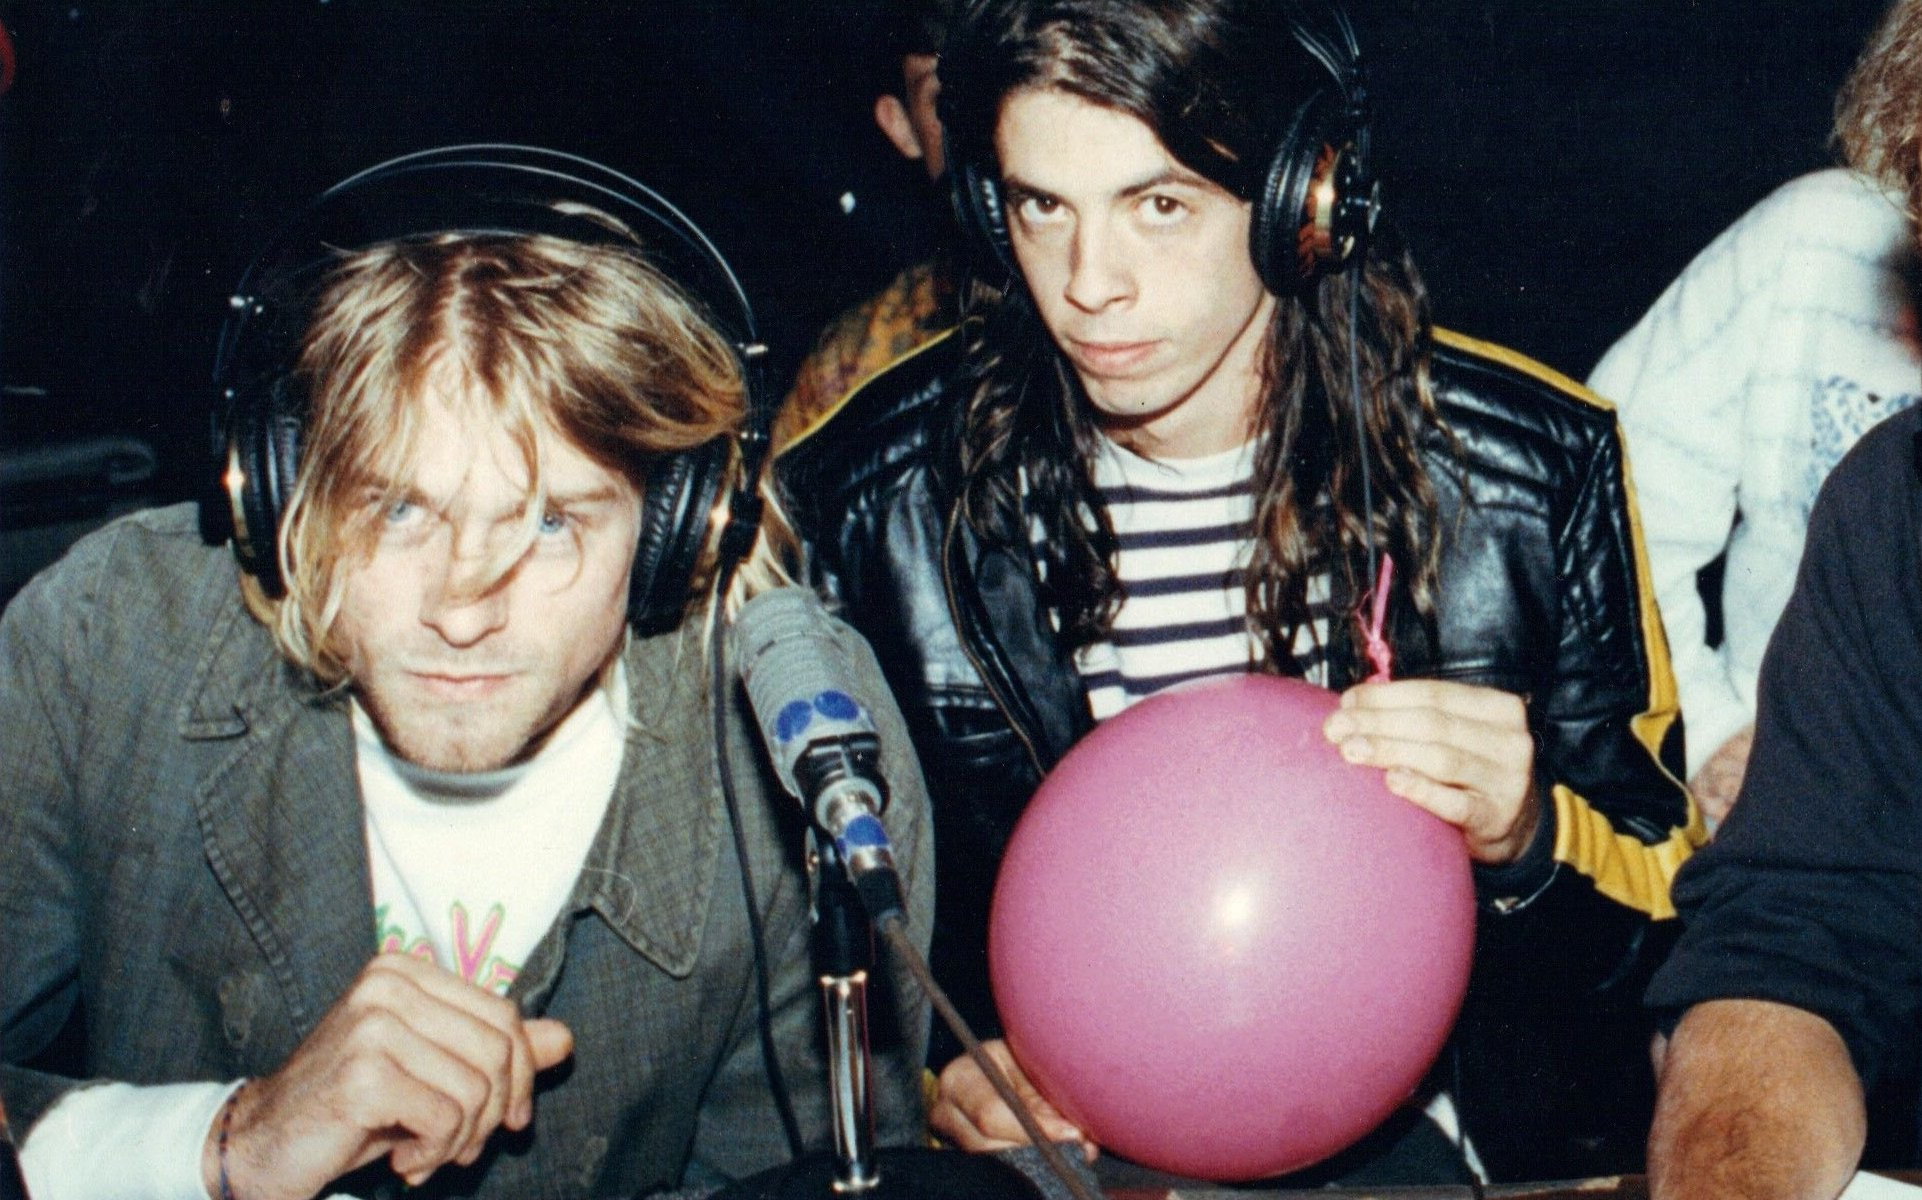 Nirvana 'Nevermind' at 30